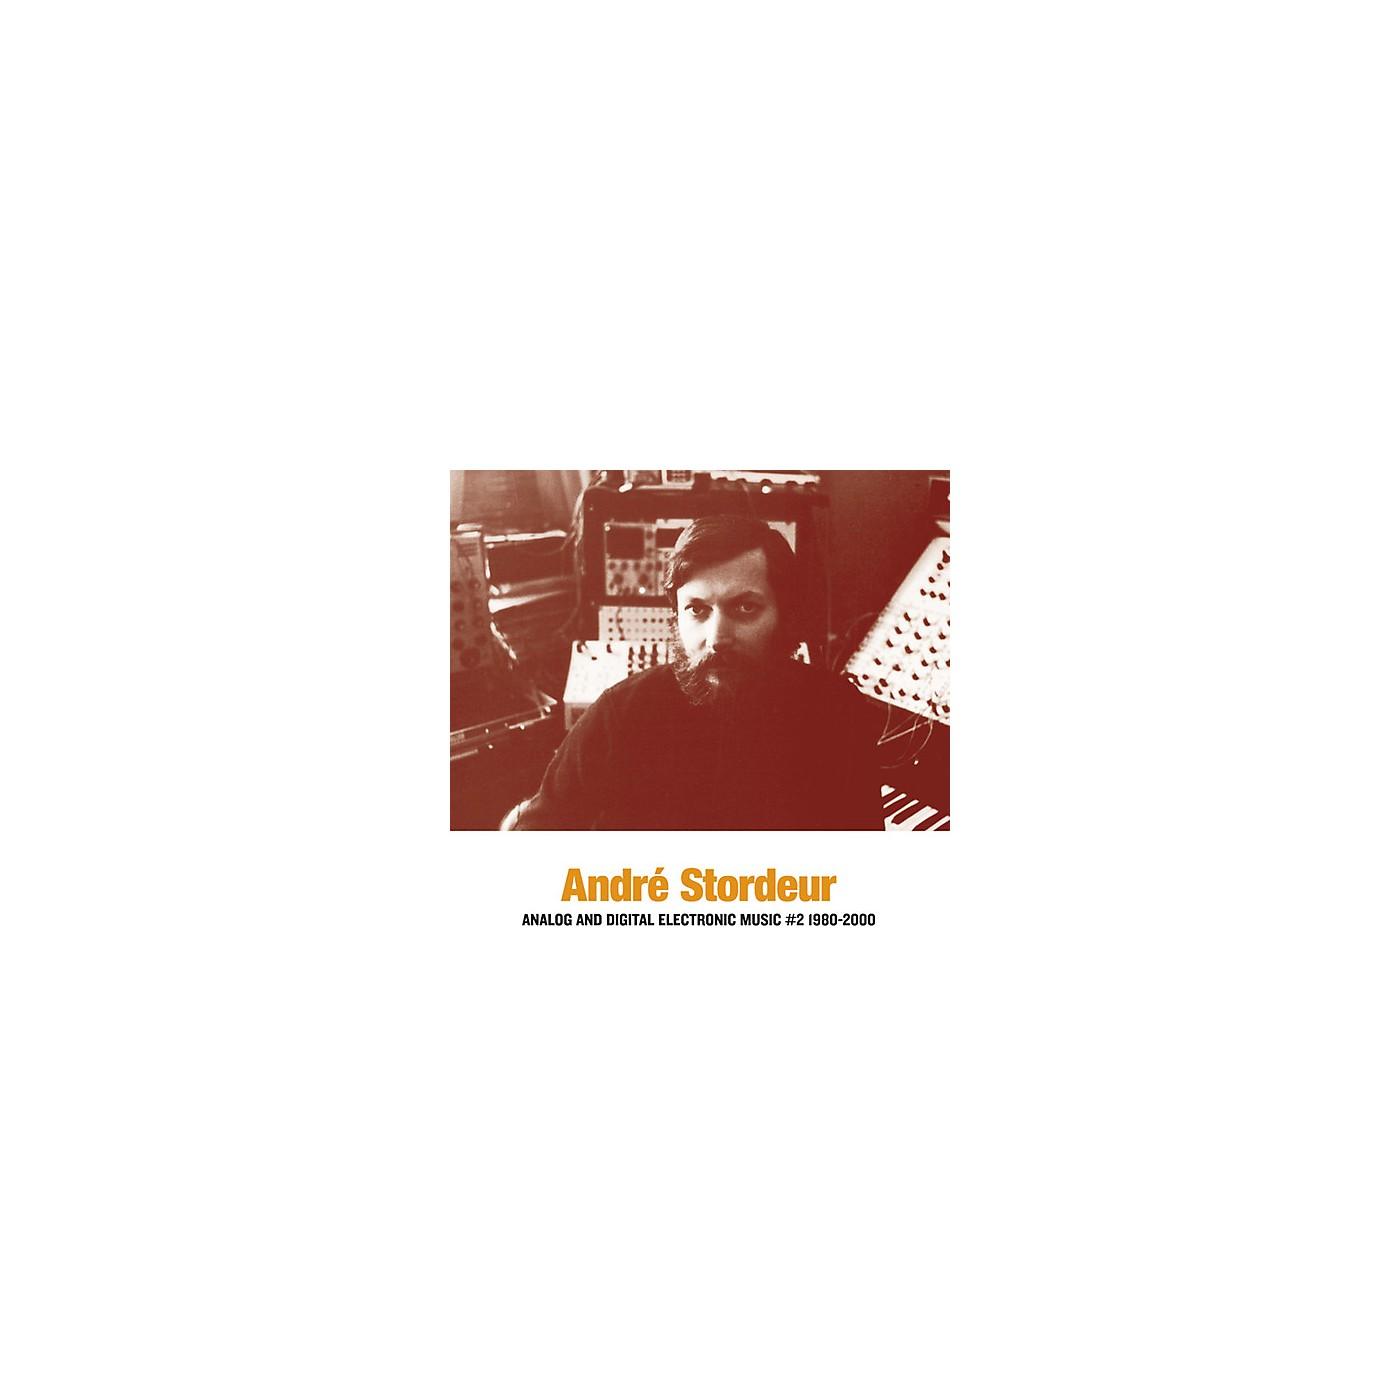 Alliance Andre Stordeur - Analog & Digital Electronic Music #2 1980-2000 thumbnail